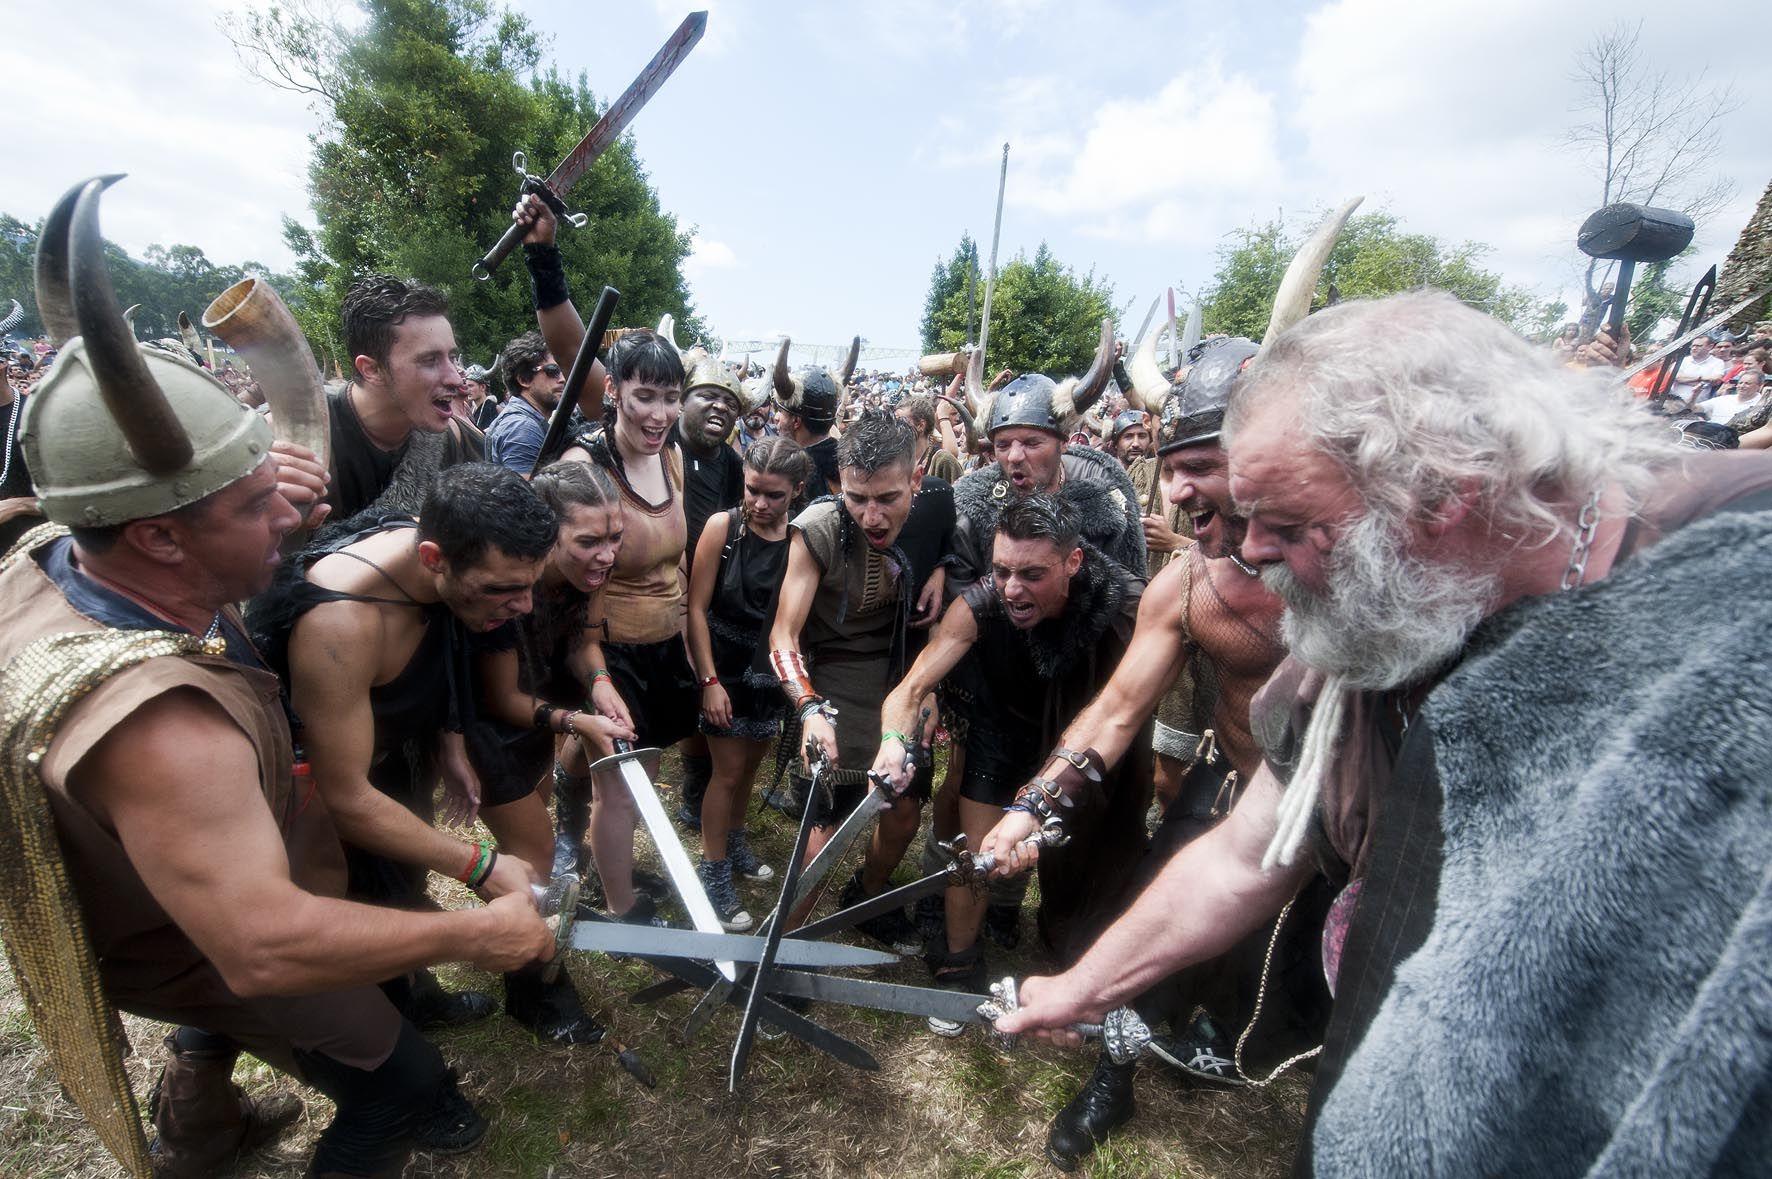 Romería Vikinga Catoira, Pontevedra